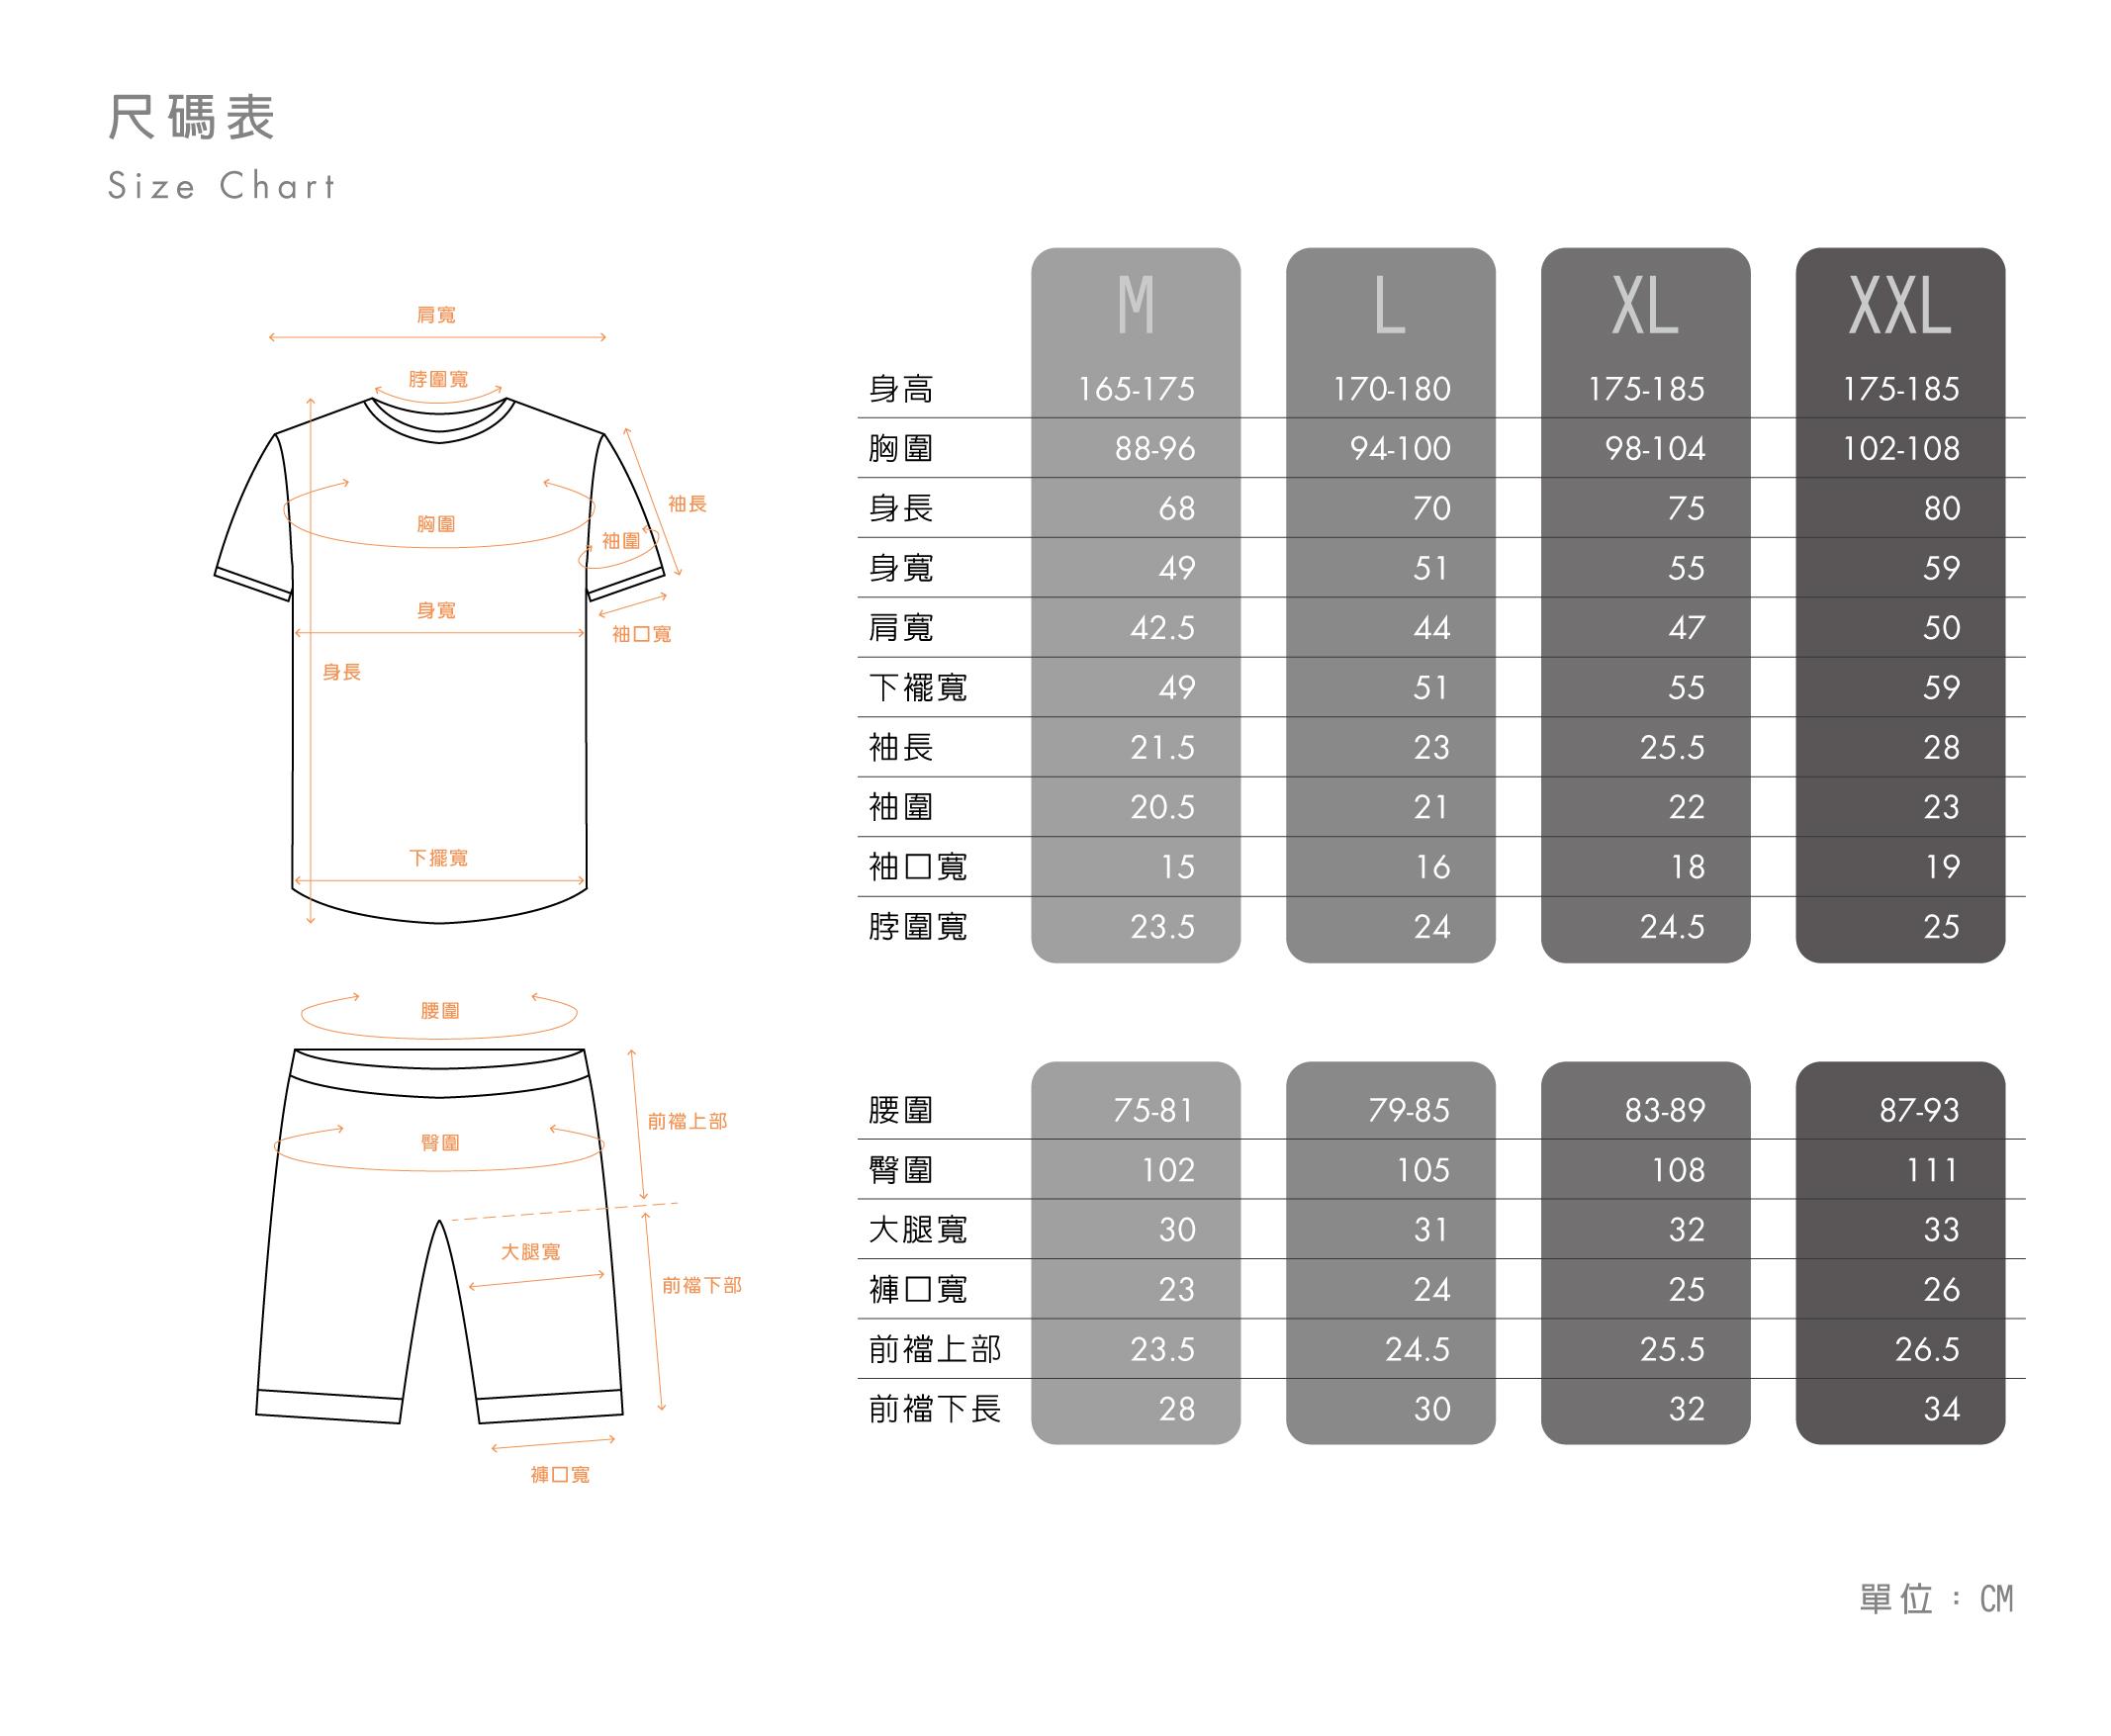 尺碼表_STANDARD DRY men's size chart 短袖.jpg